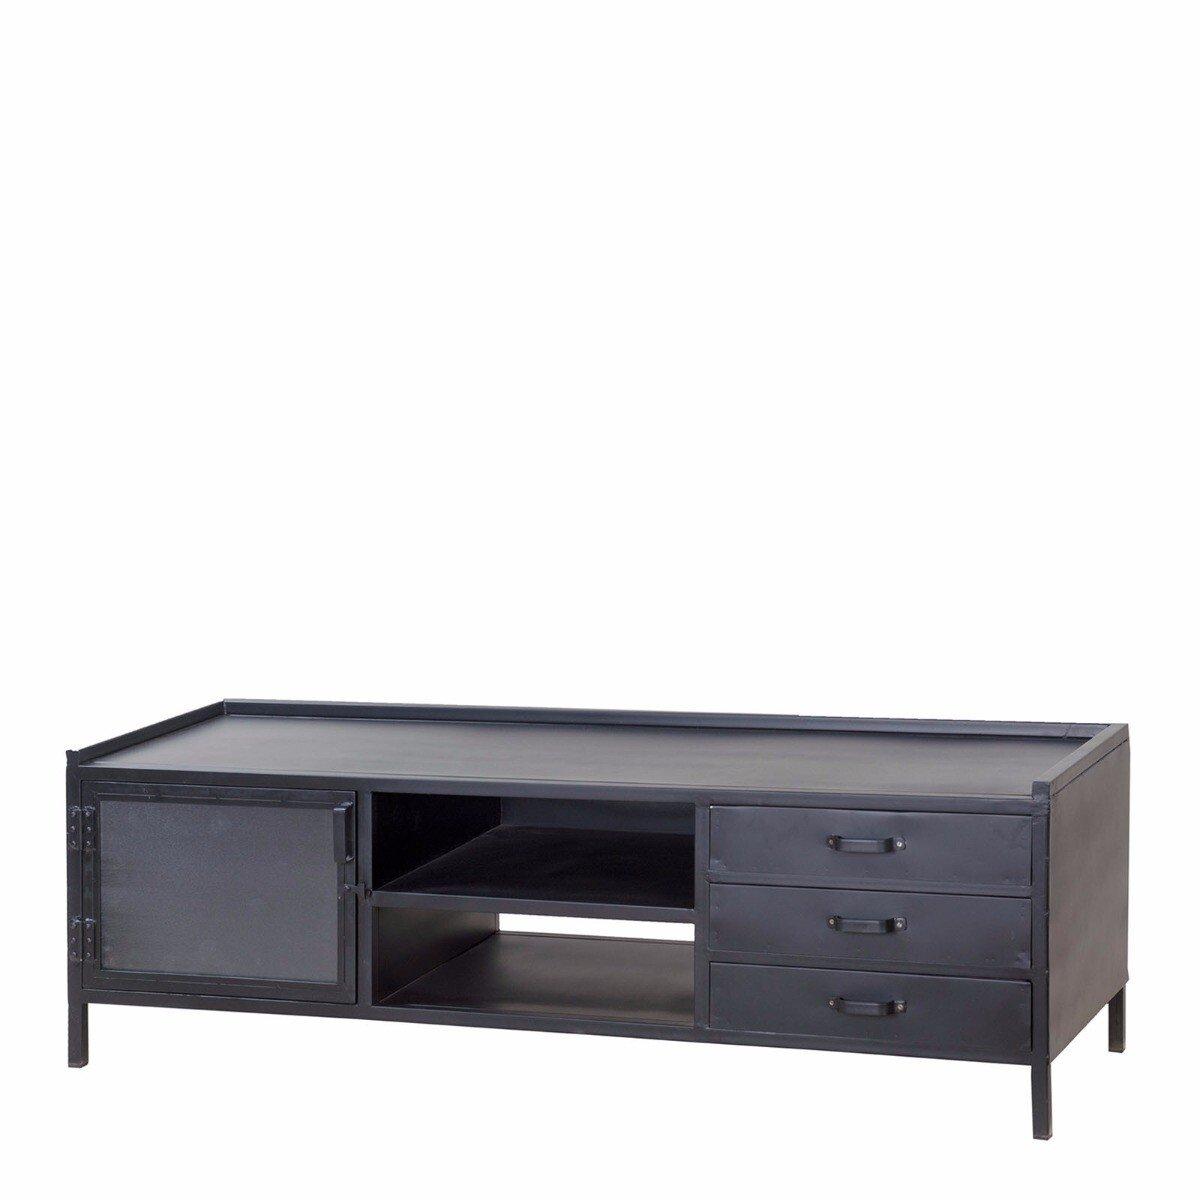 Eleonora TV meubel Industrieel 50 x 160 x 50